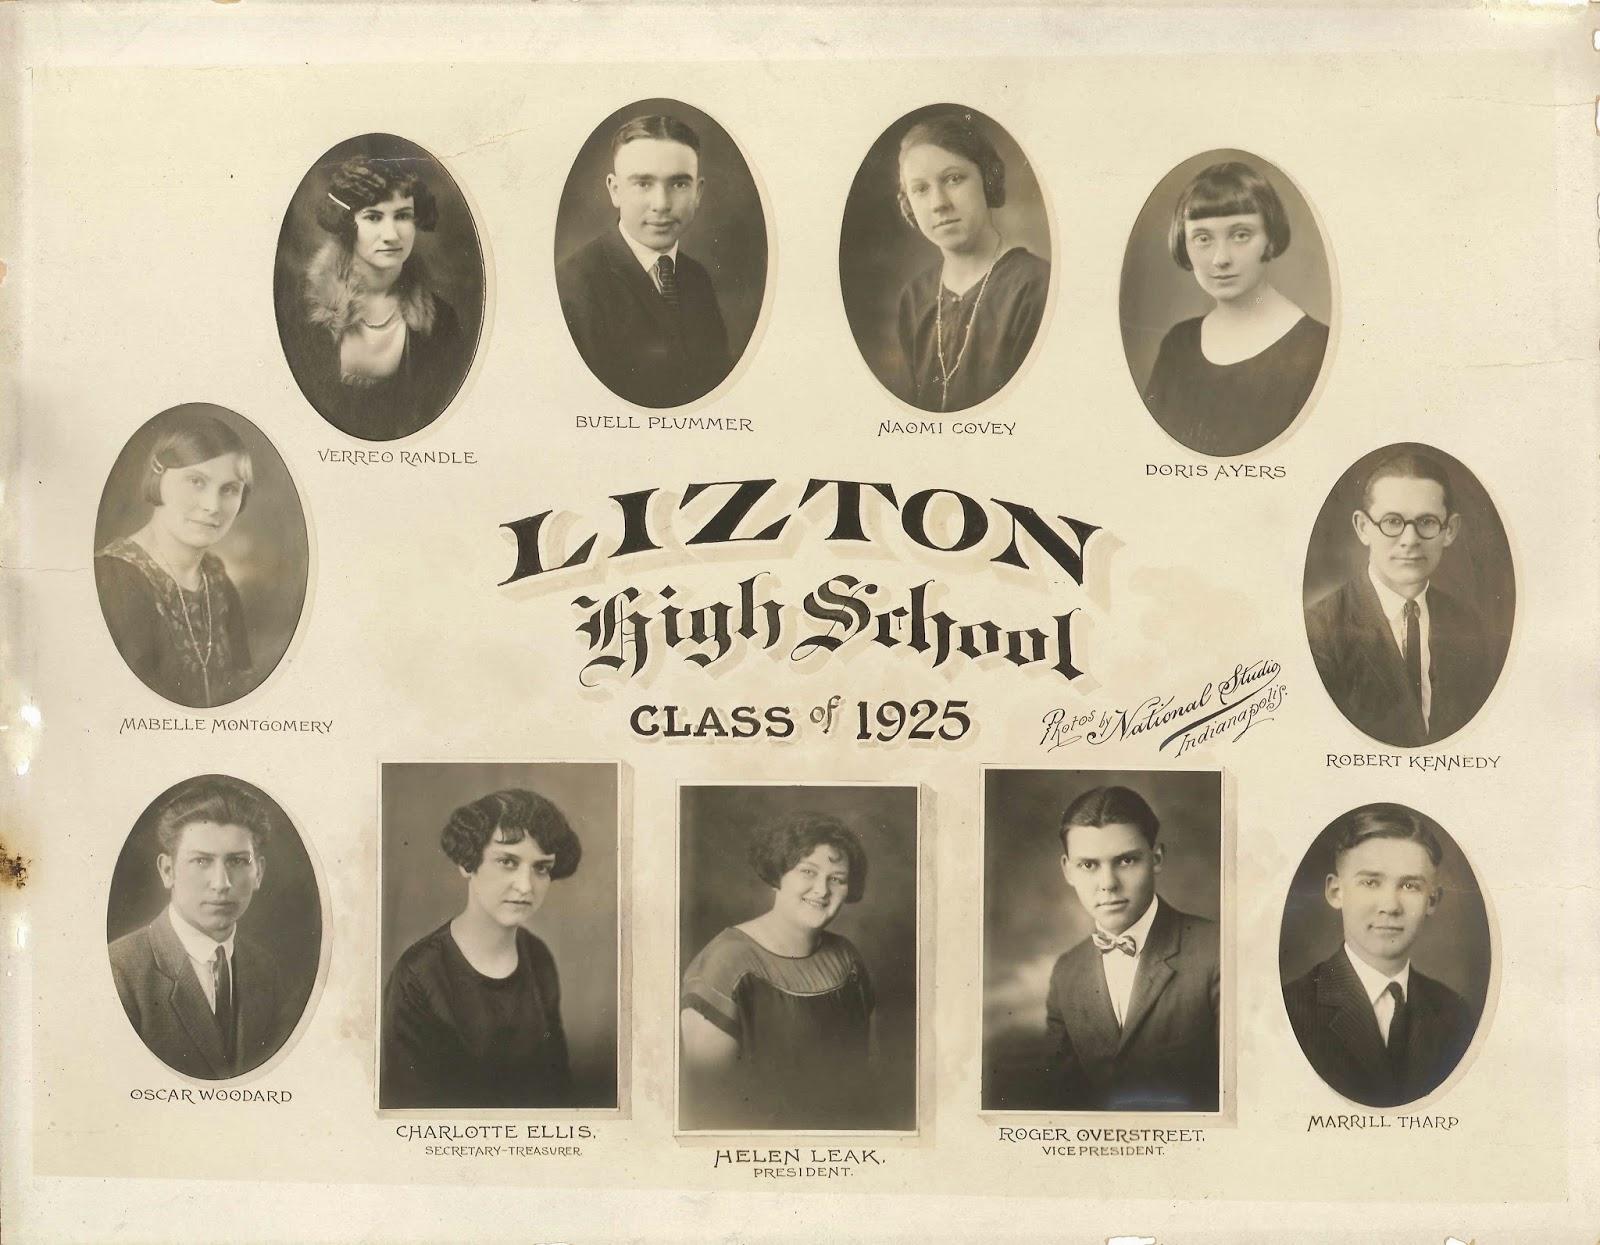 Indiana hendricks county lizton - Found Lizton High School 1925 Class Photo